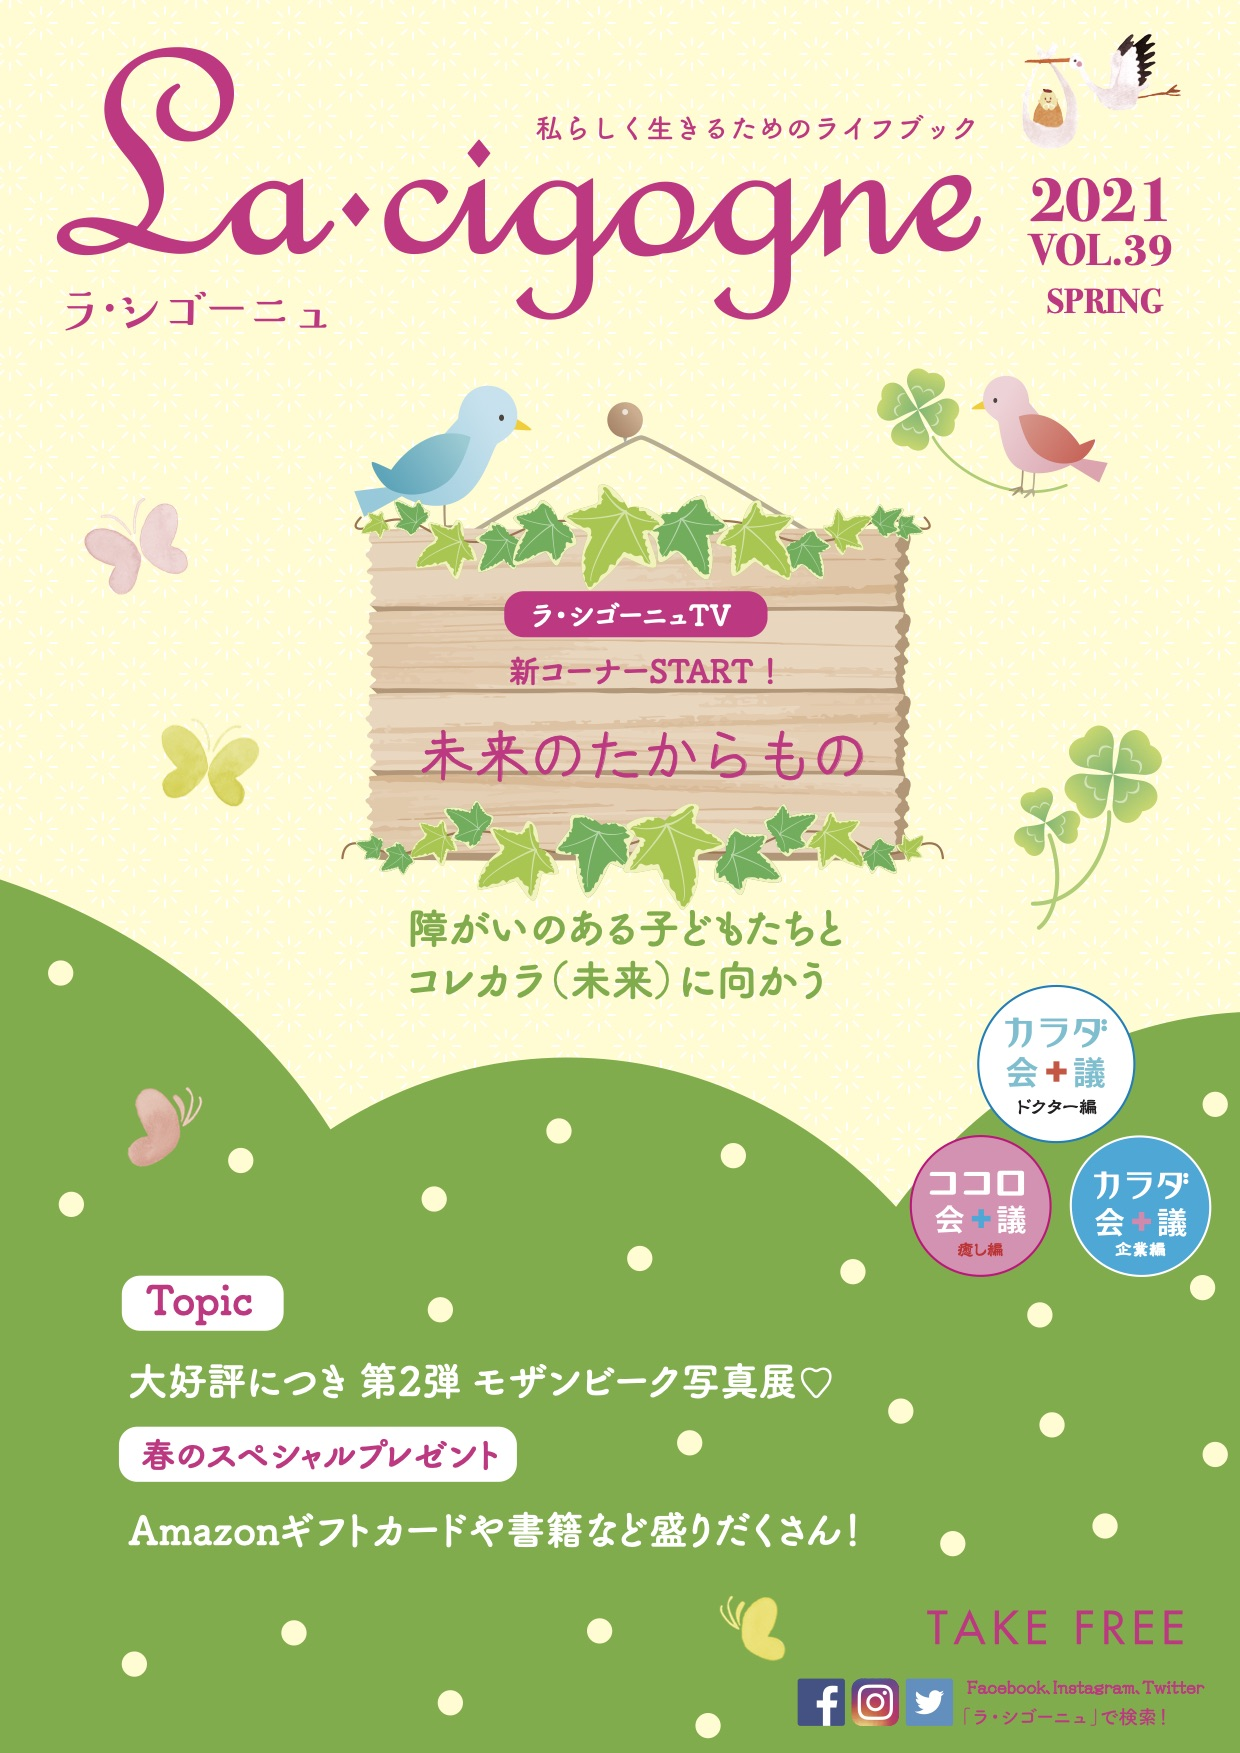 【Vol.39】2021年春号 発行中です。